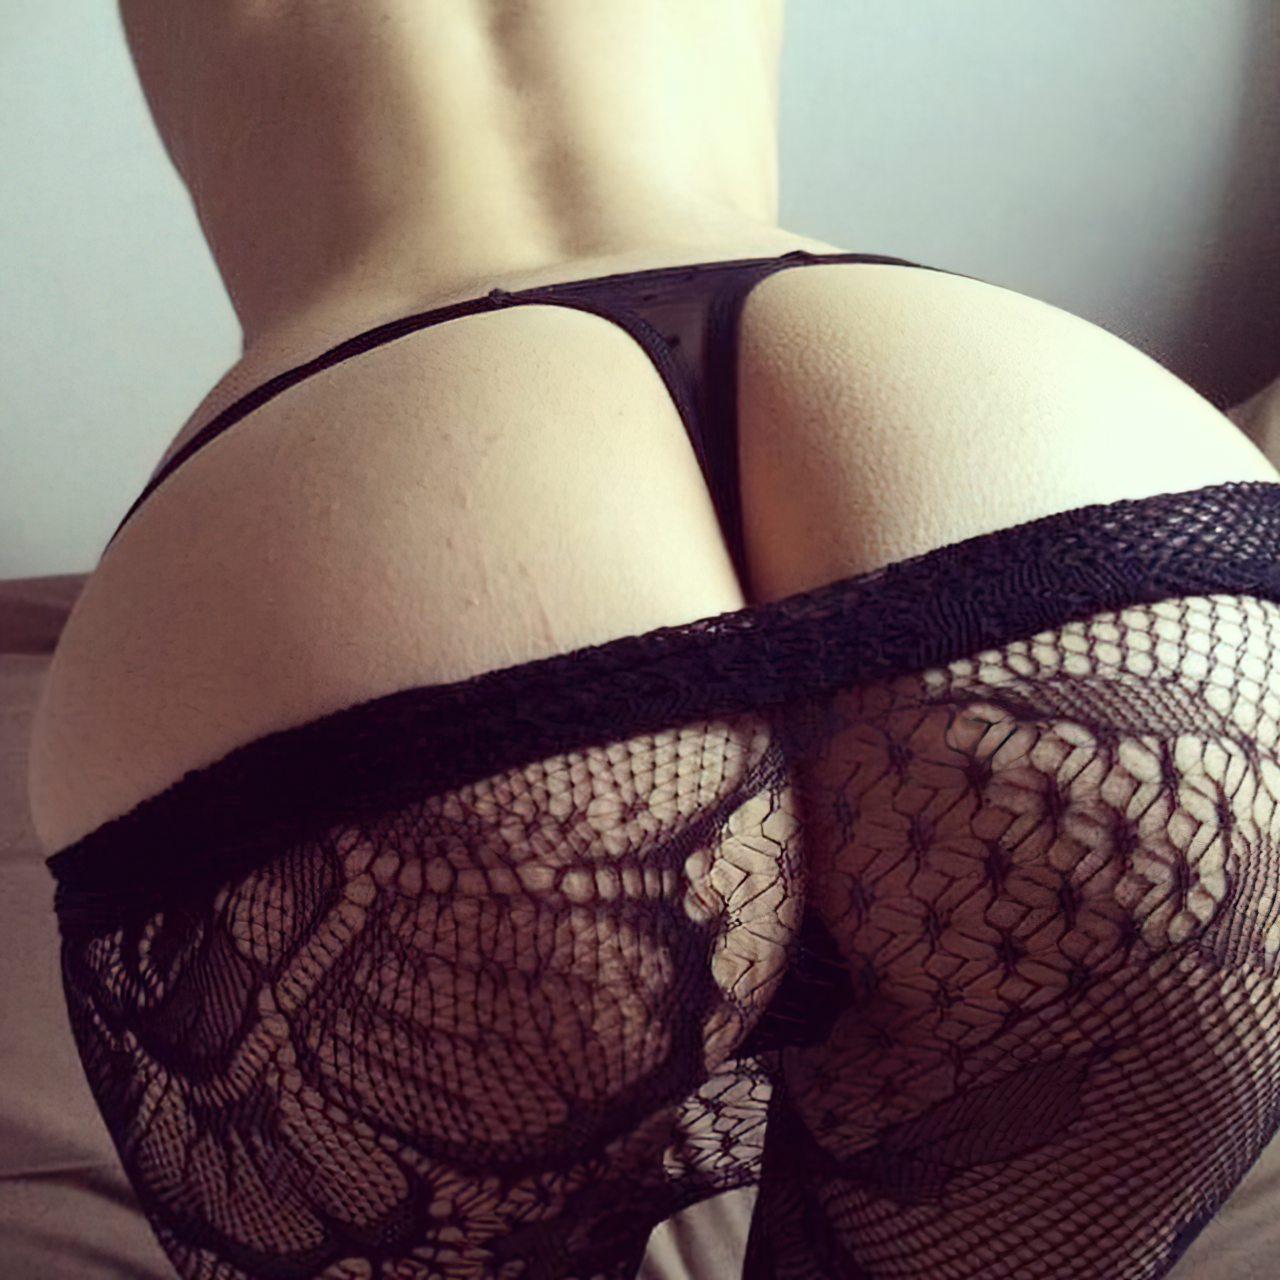 Bundinha Sexy